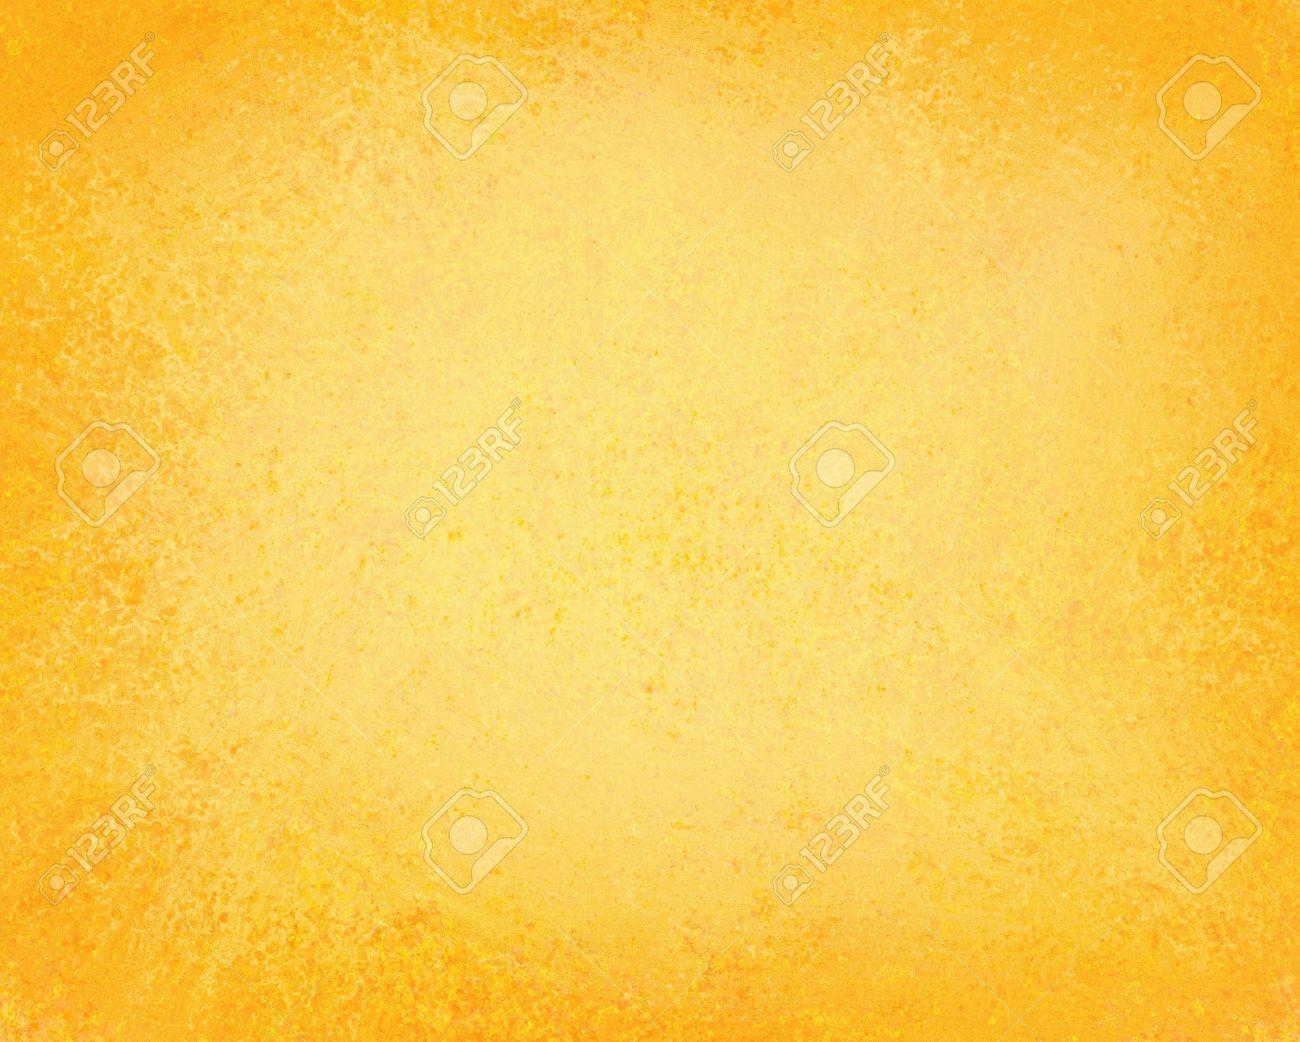 23 Vintage Yellow Aesthetic Wallpaper 2k Inspirational Wallpaper In 2020 Iphone Wallpaper Yellow Yellow Aesthetic Pastel Aesthetic Pastel Wallpaper